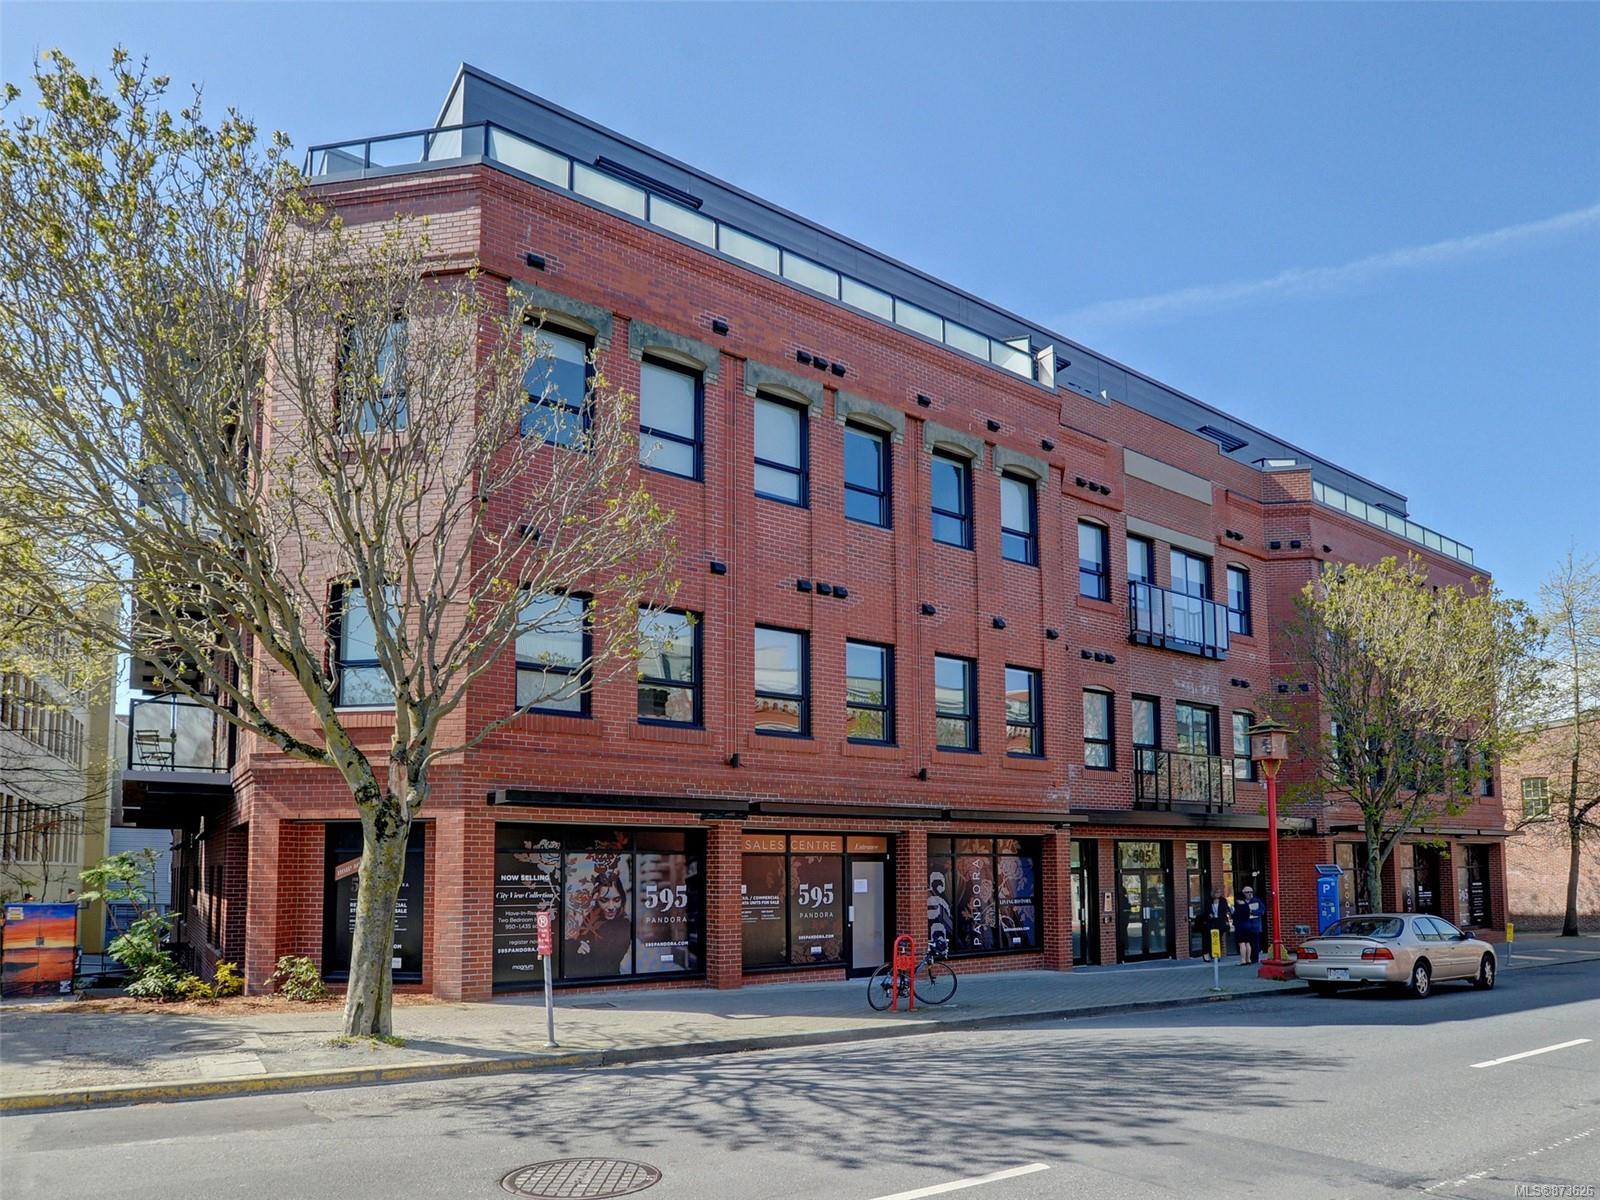 405 - 595 Pandora Avenue, Downtown, Victoria